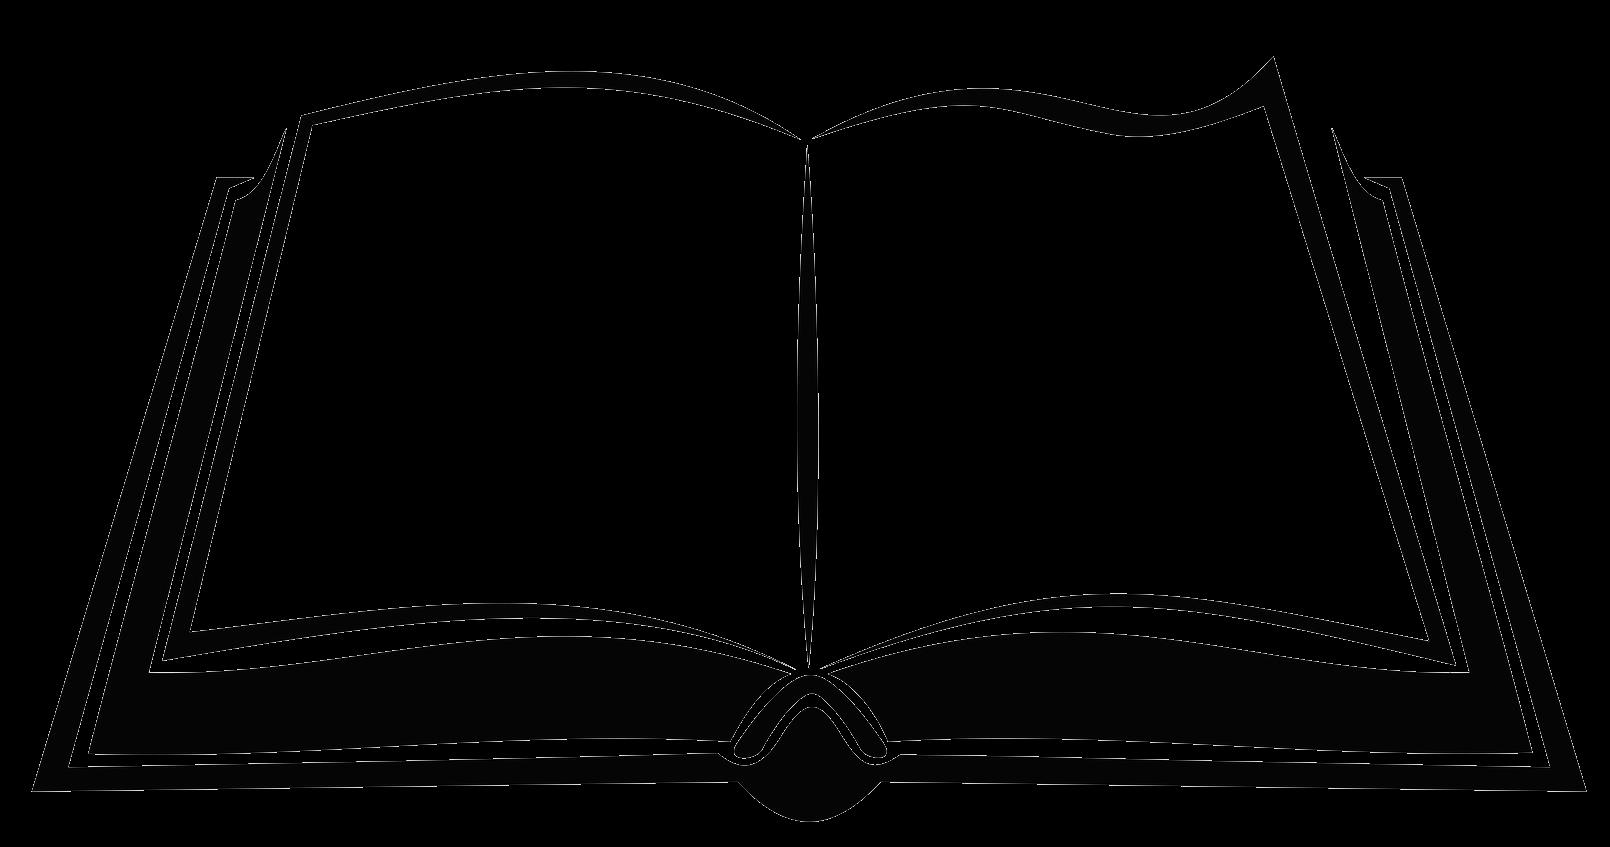 Book silhouette royaltyfree.